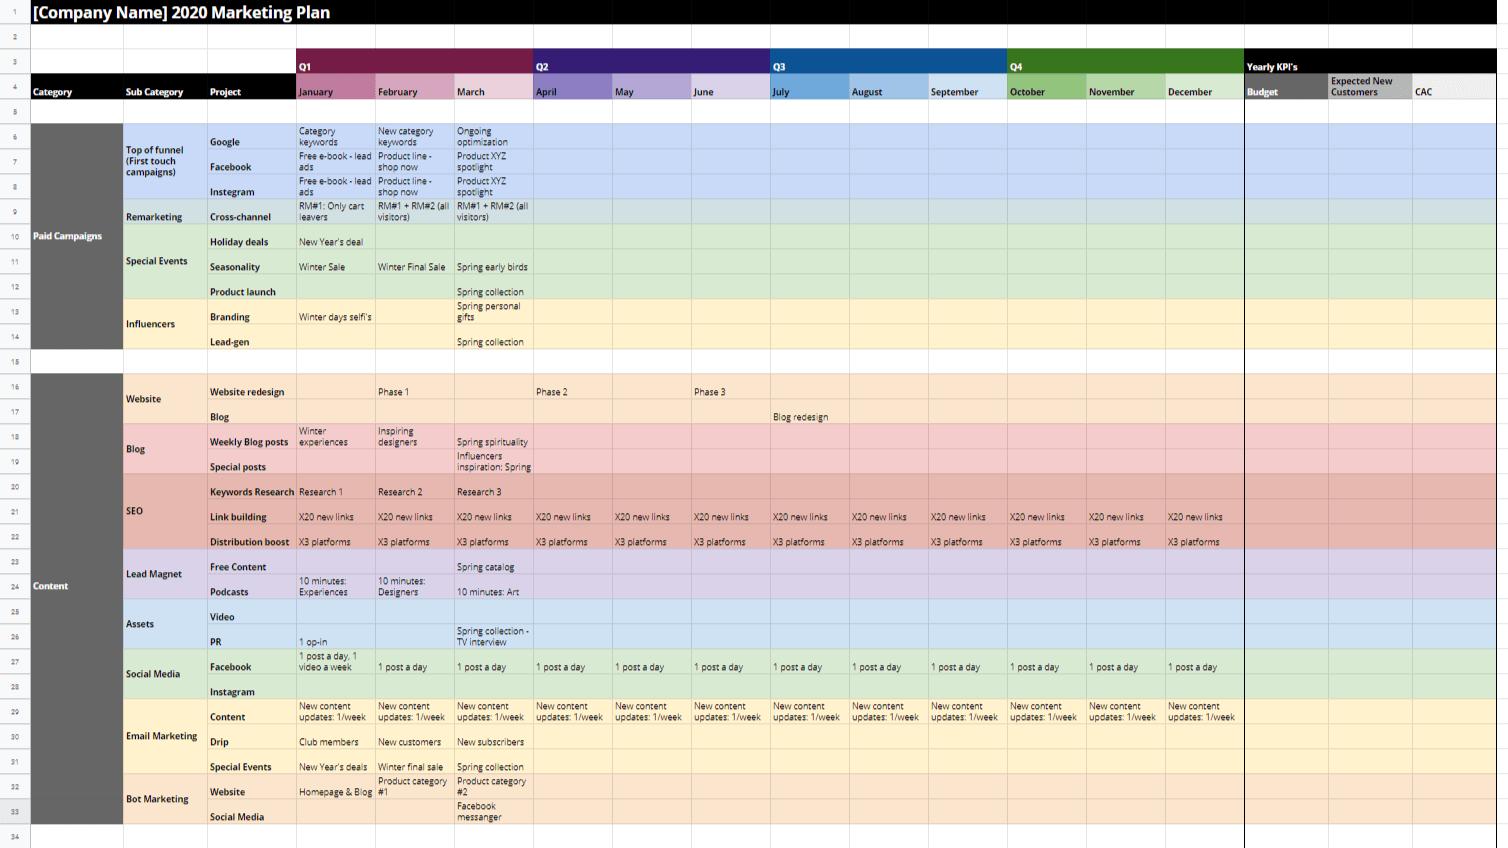 Mayple's Marketing Plan Template [2021]